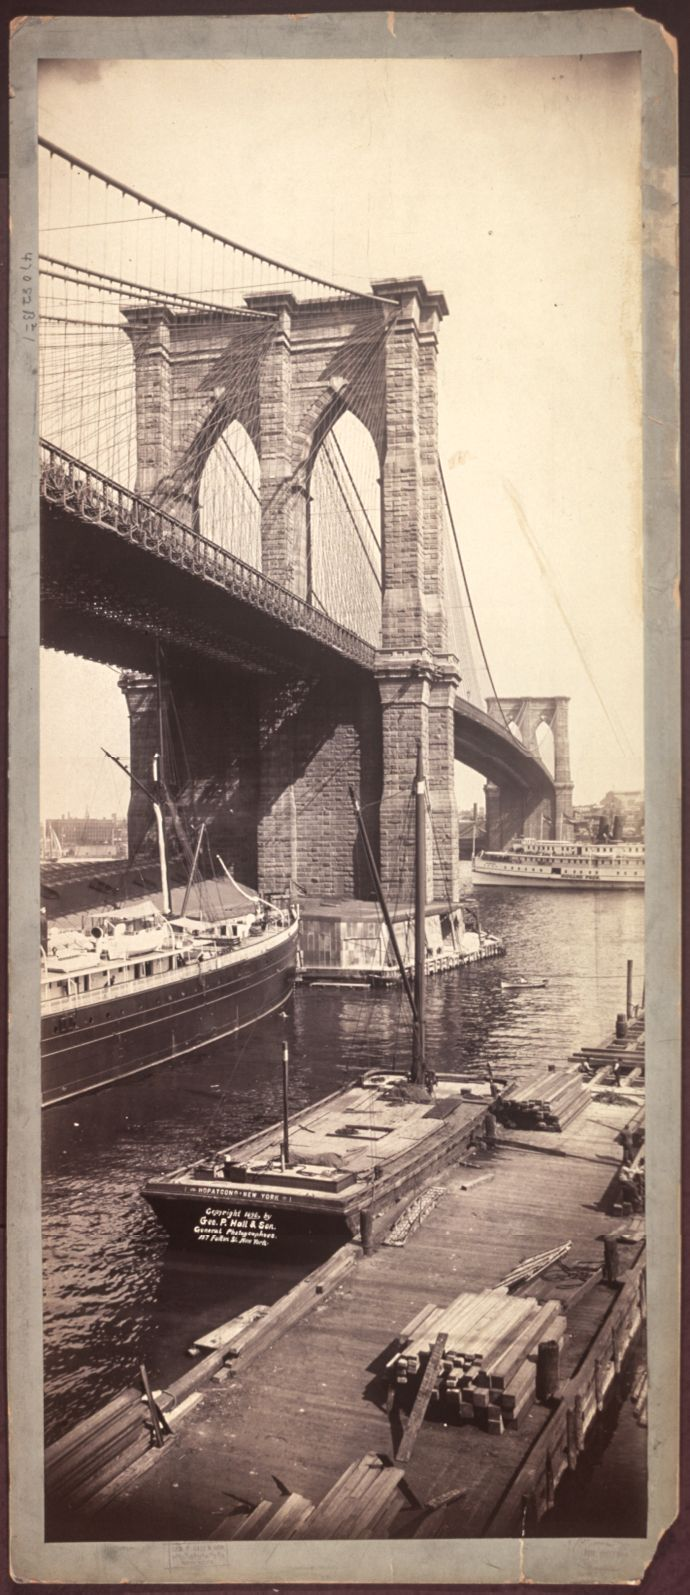 New York. The Brooklyn Bridge, 1896.